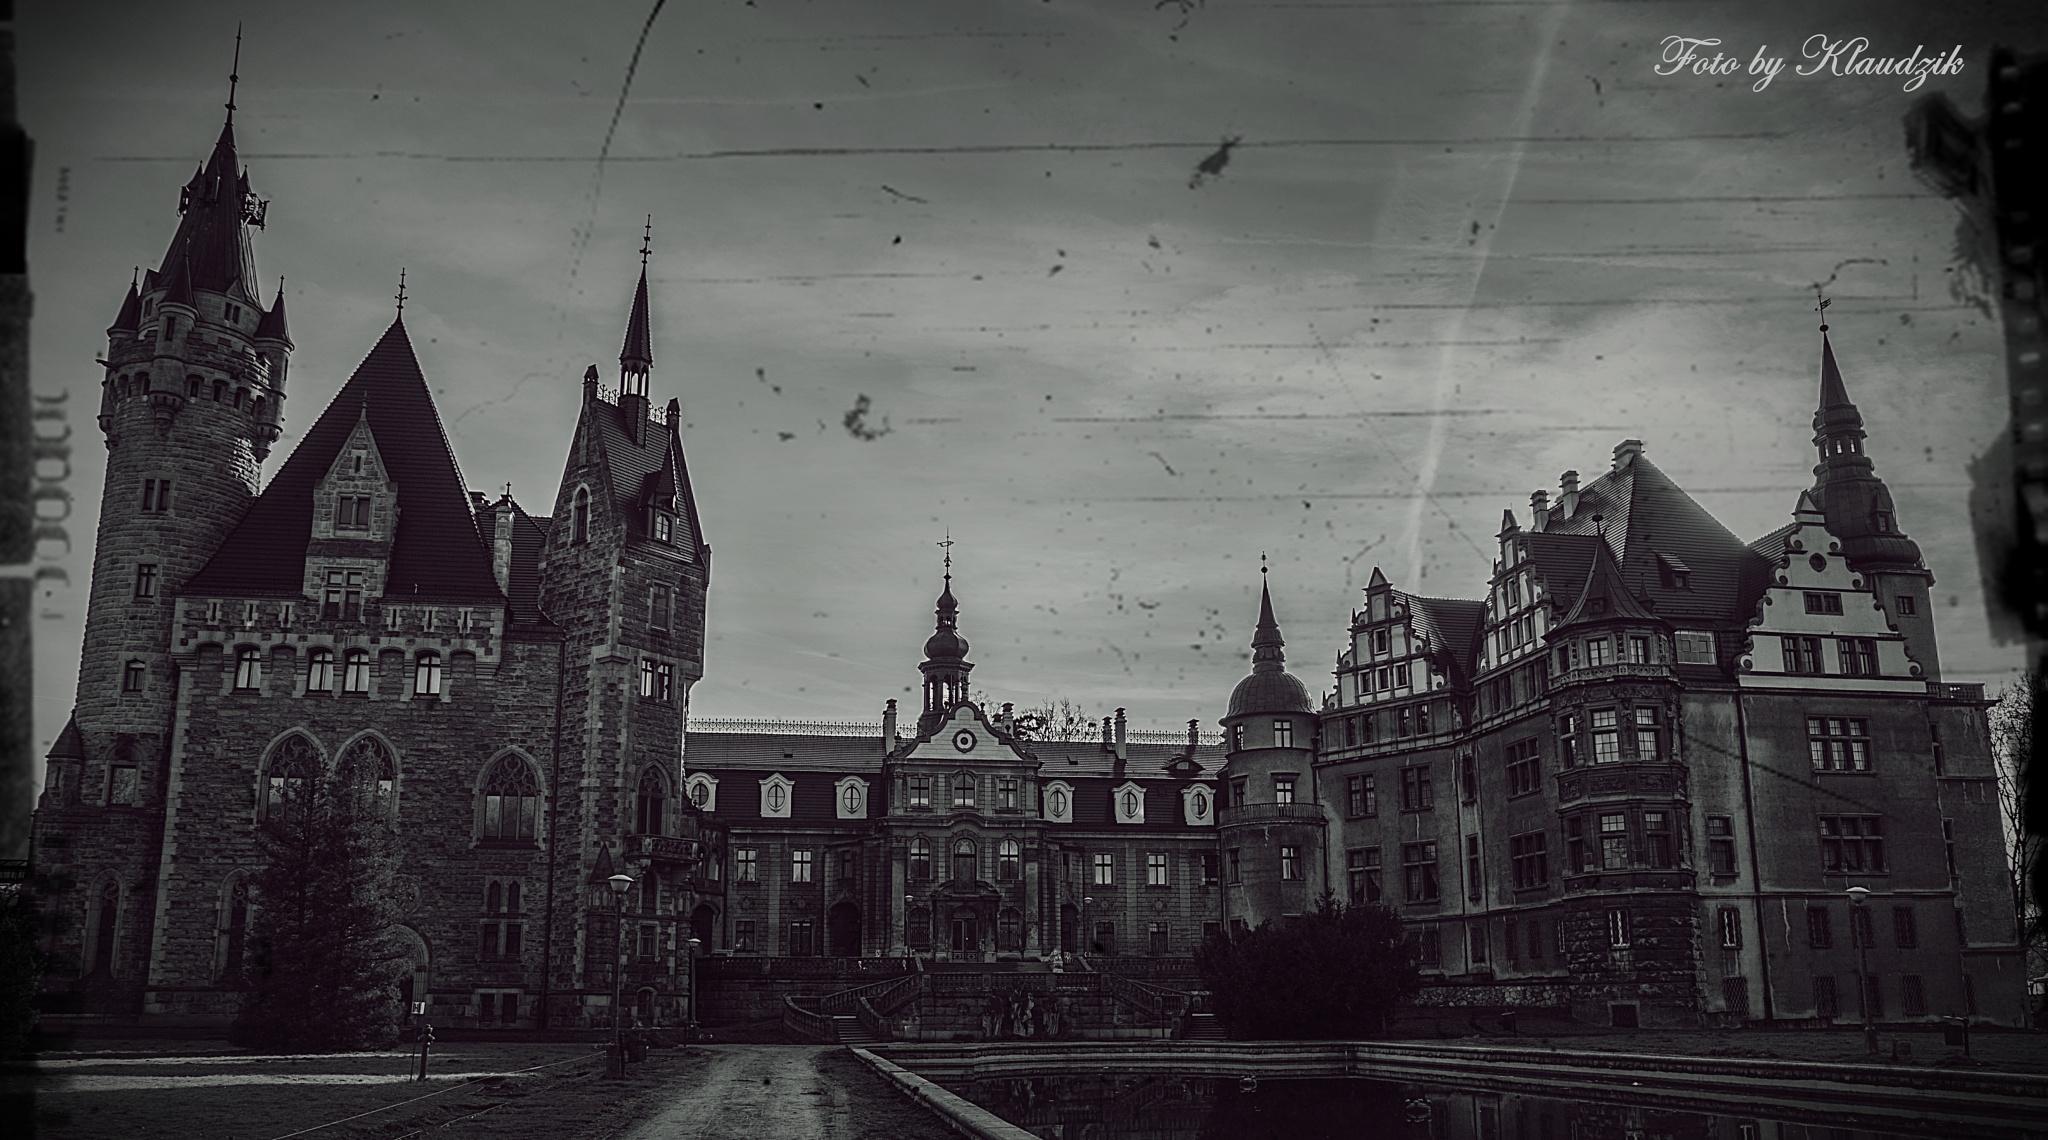 Zamek  by Klaudia Bochenek